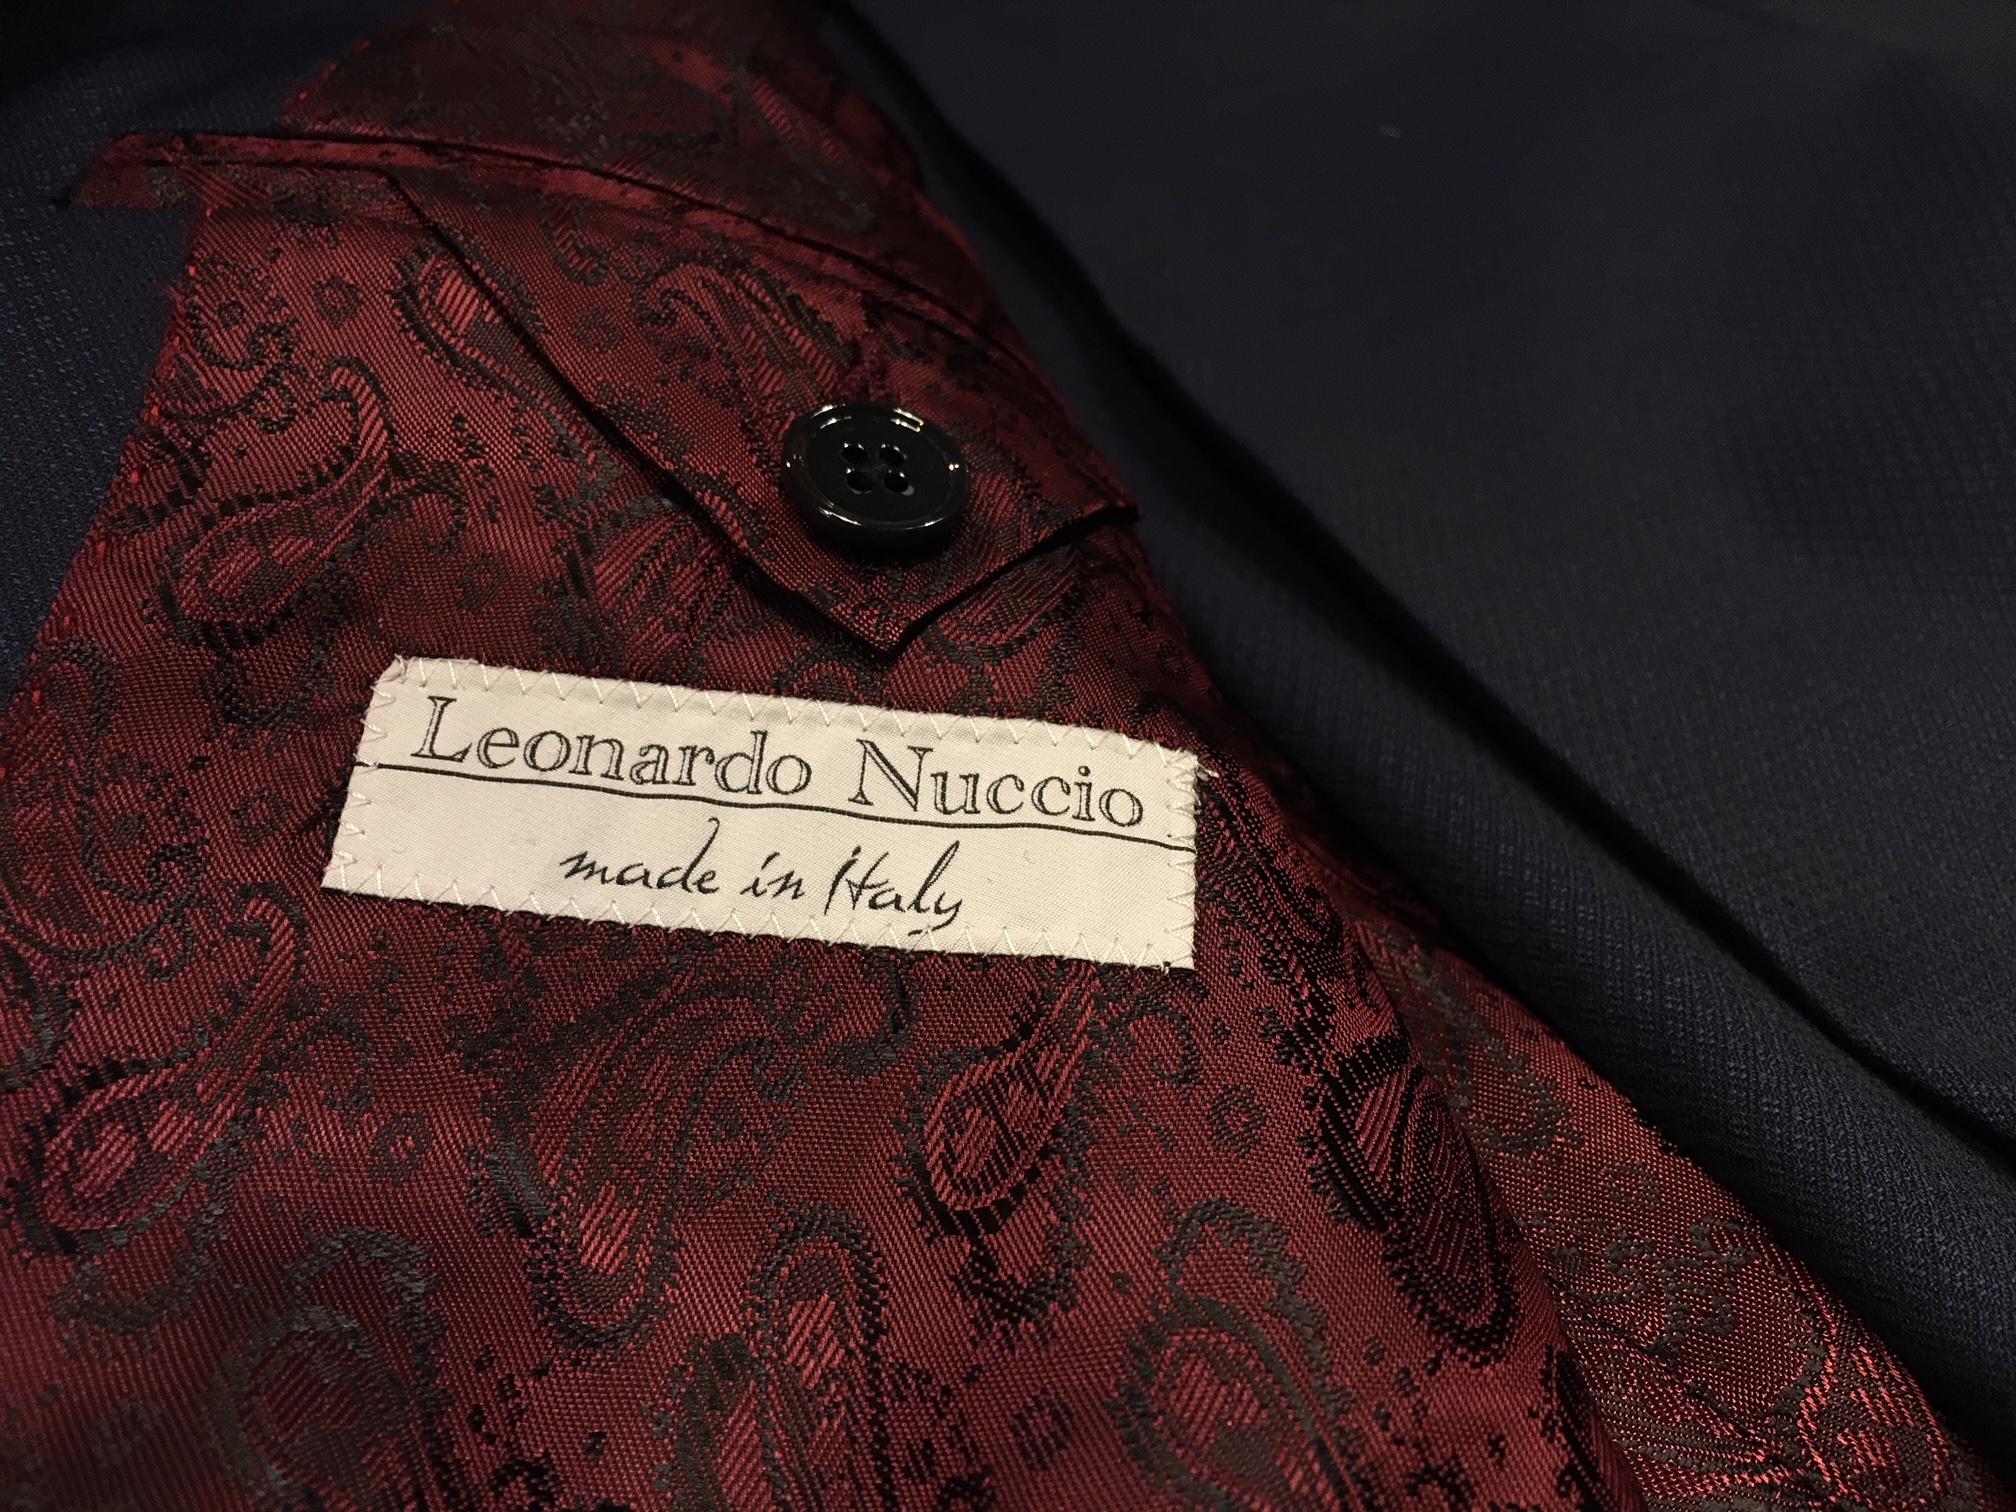 Leonardo Nuccio (foto di Germana Cabrelle)